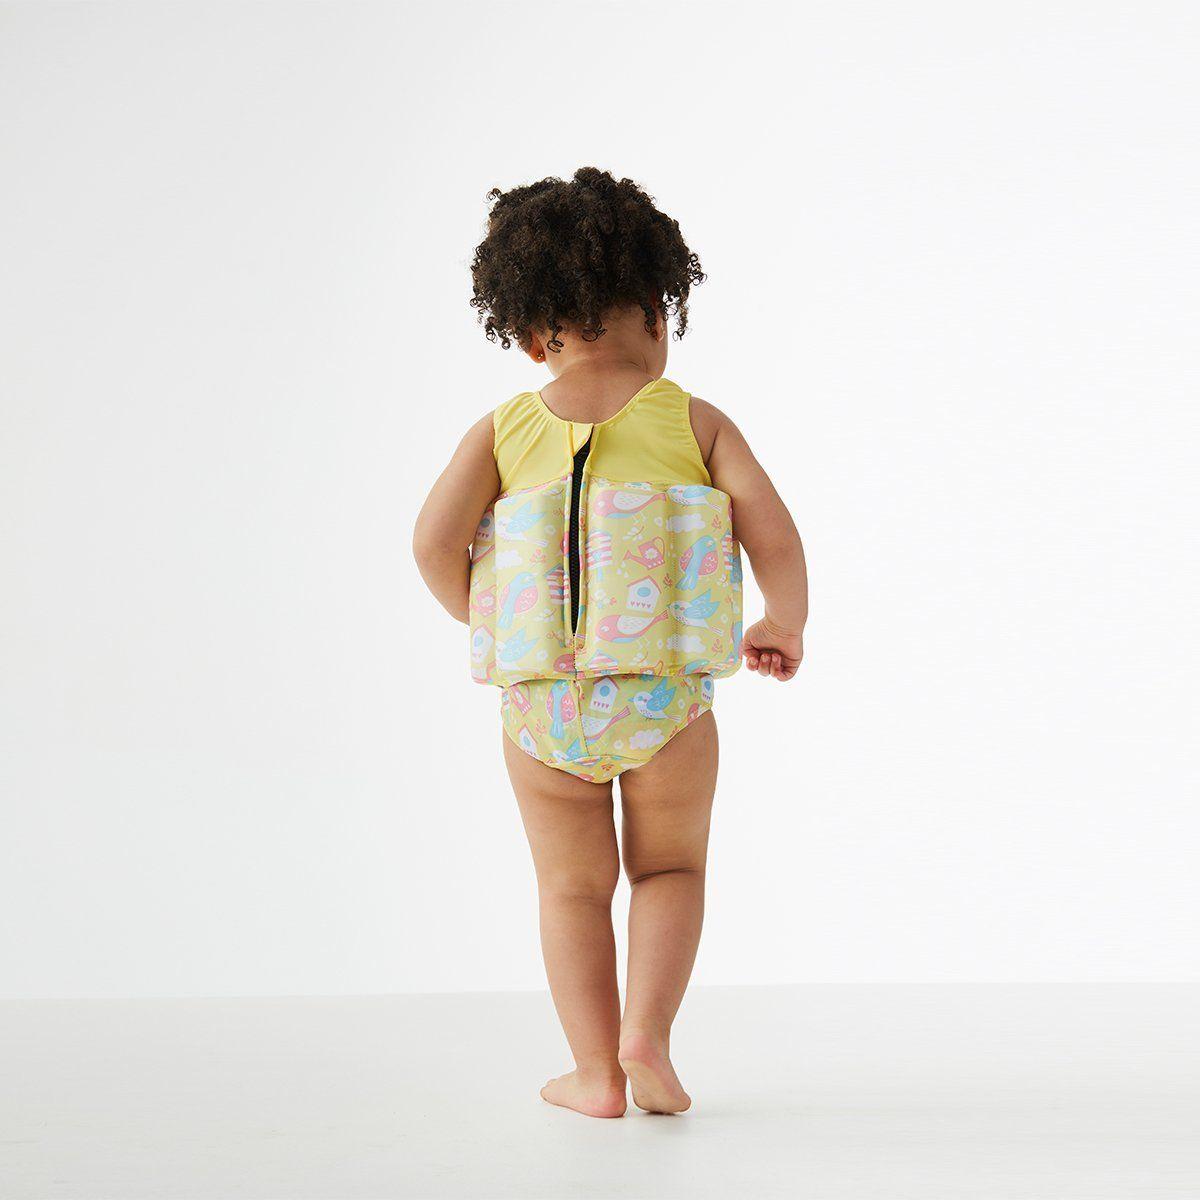 Navy /& White Stripe Splash About Float Suit with Adjustable Buoyancy Swimwear